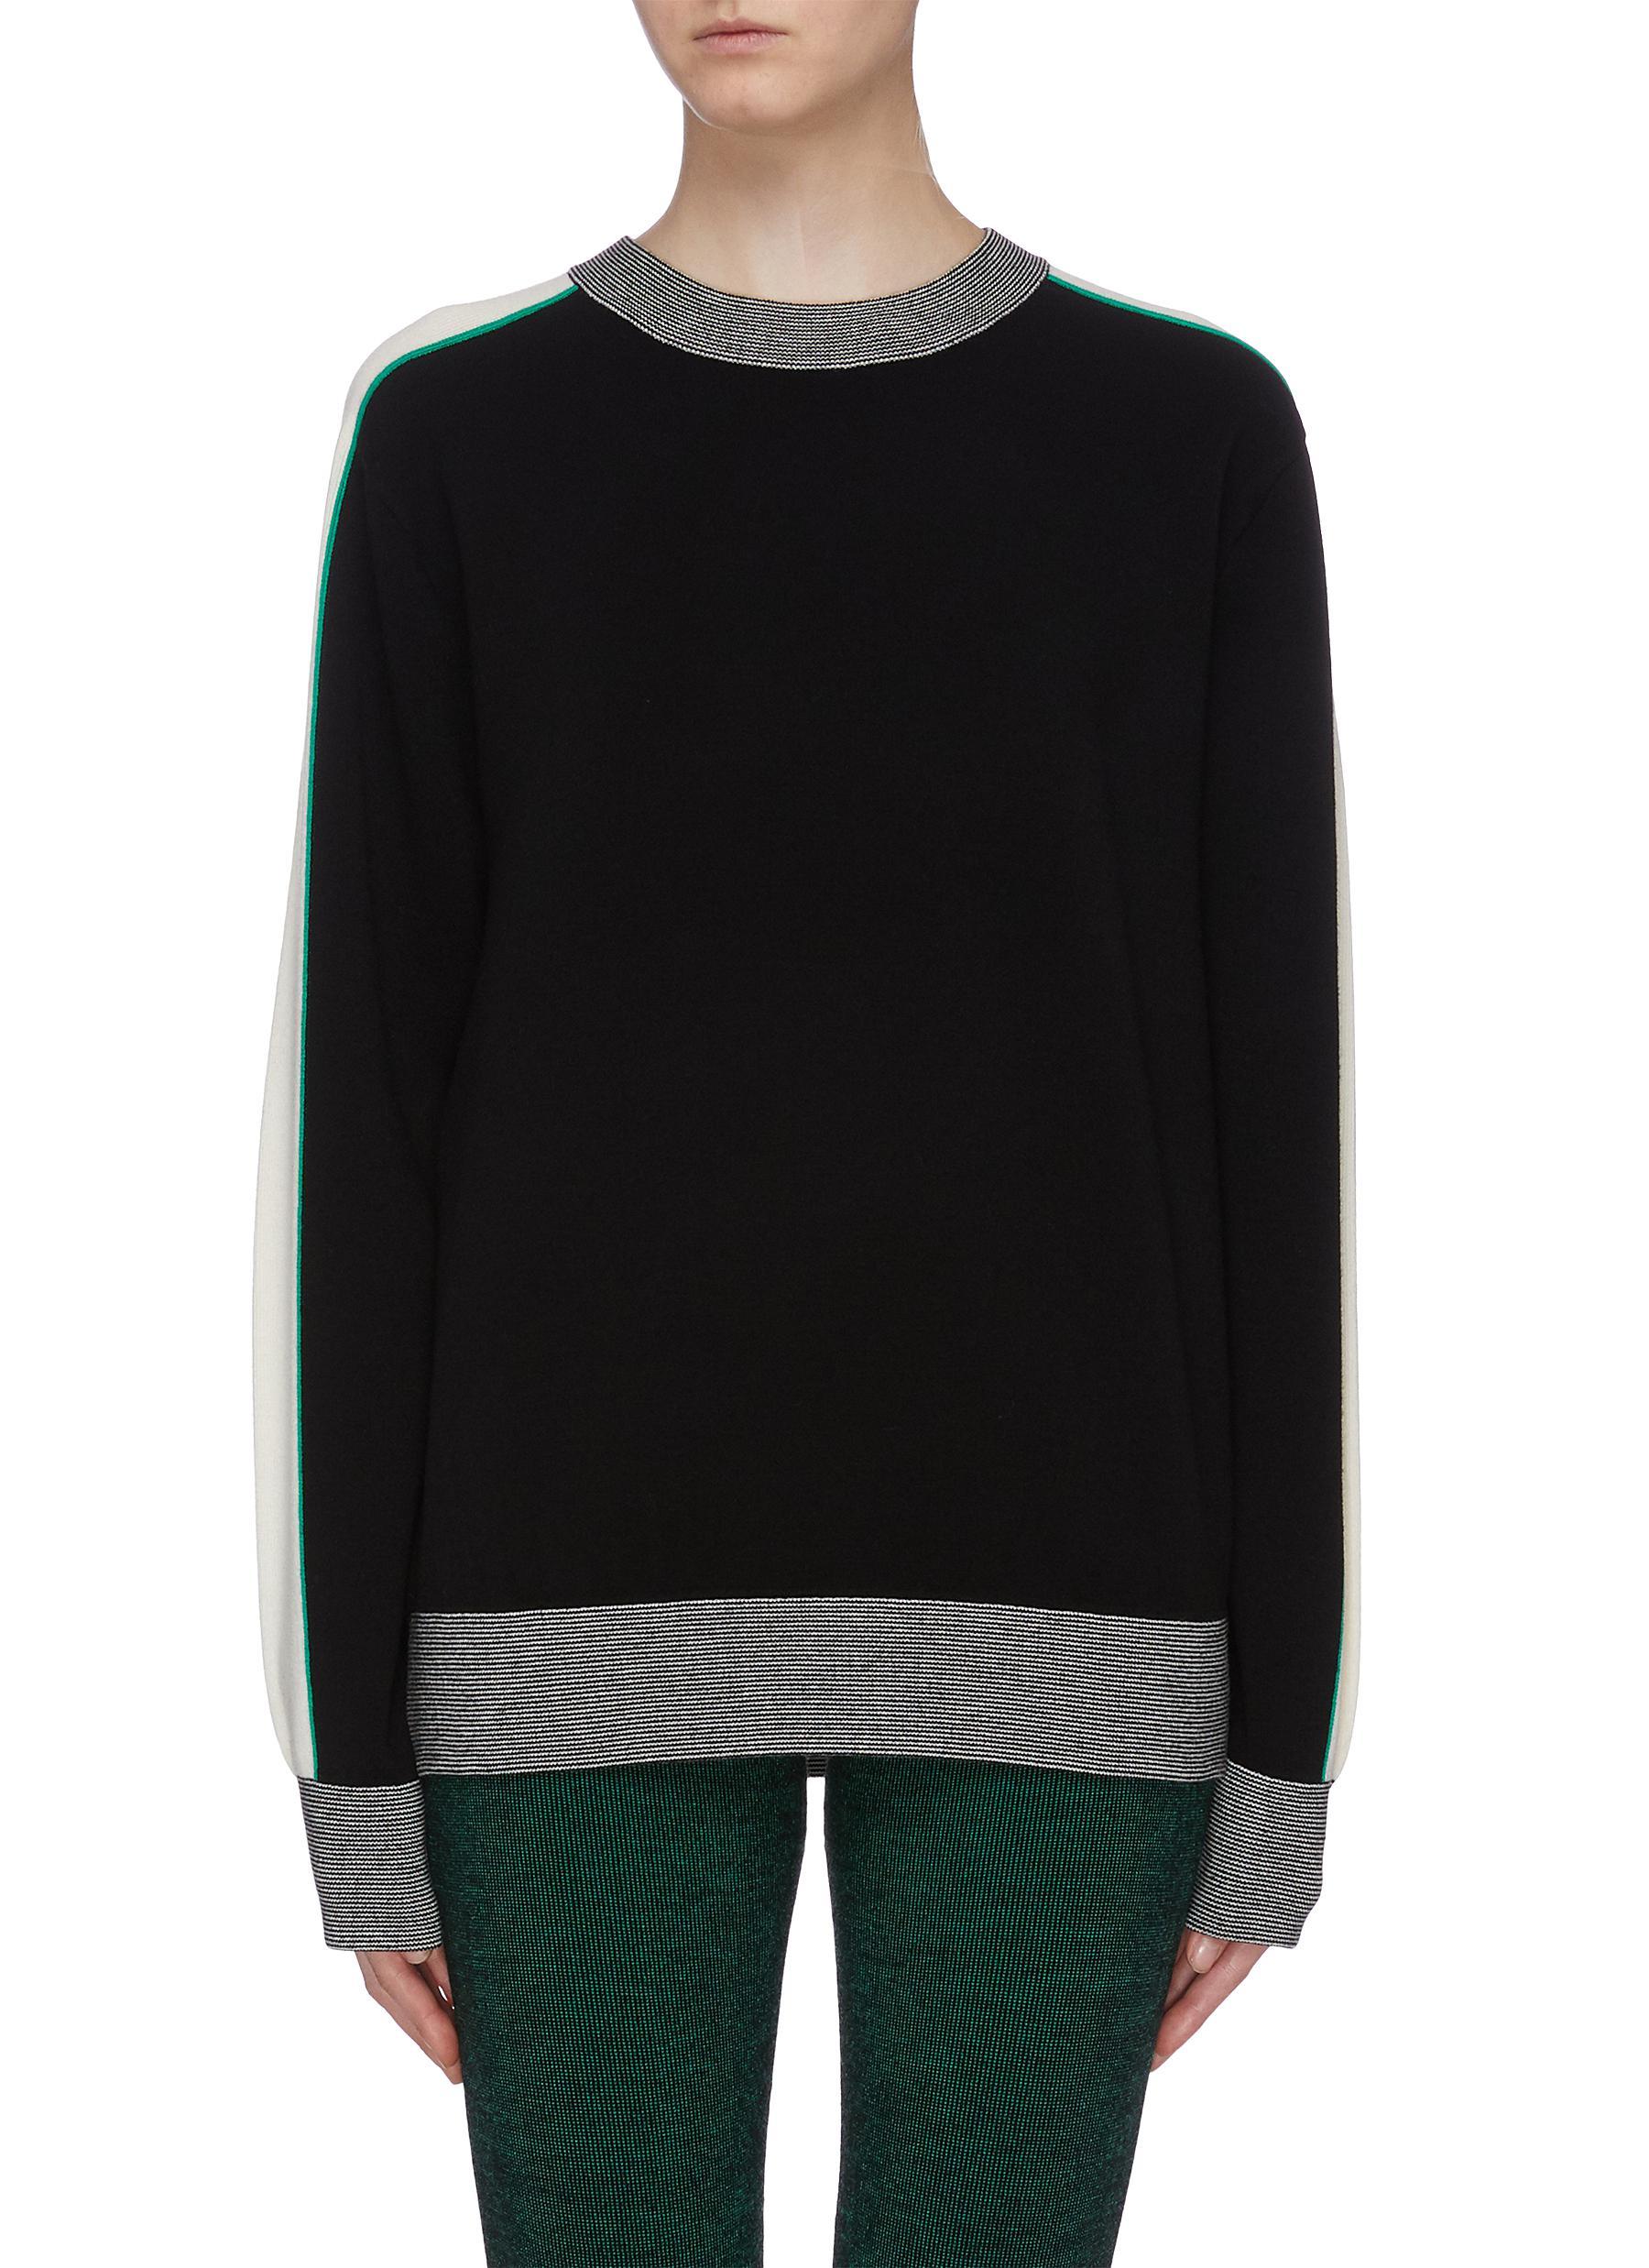 Stripe sleeve sweater by Nagnata